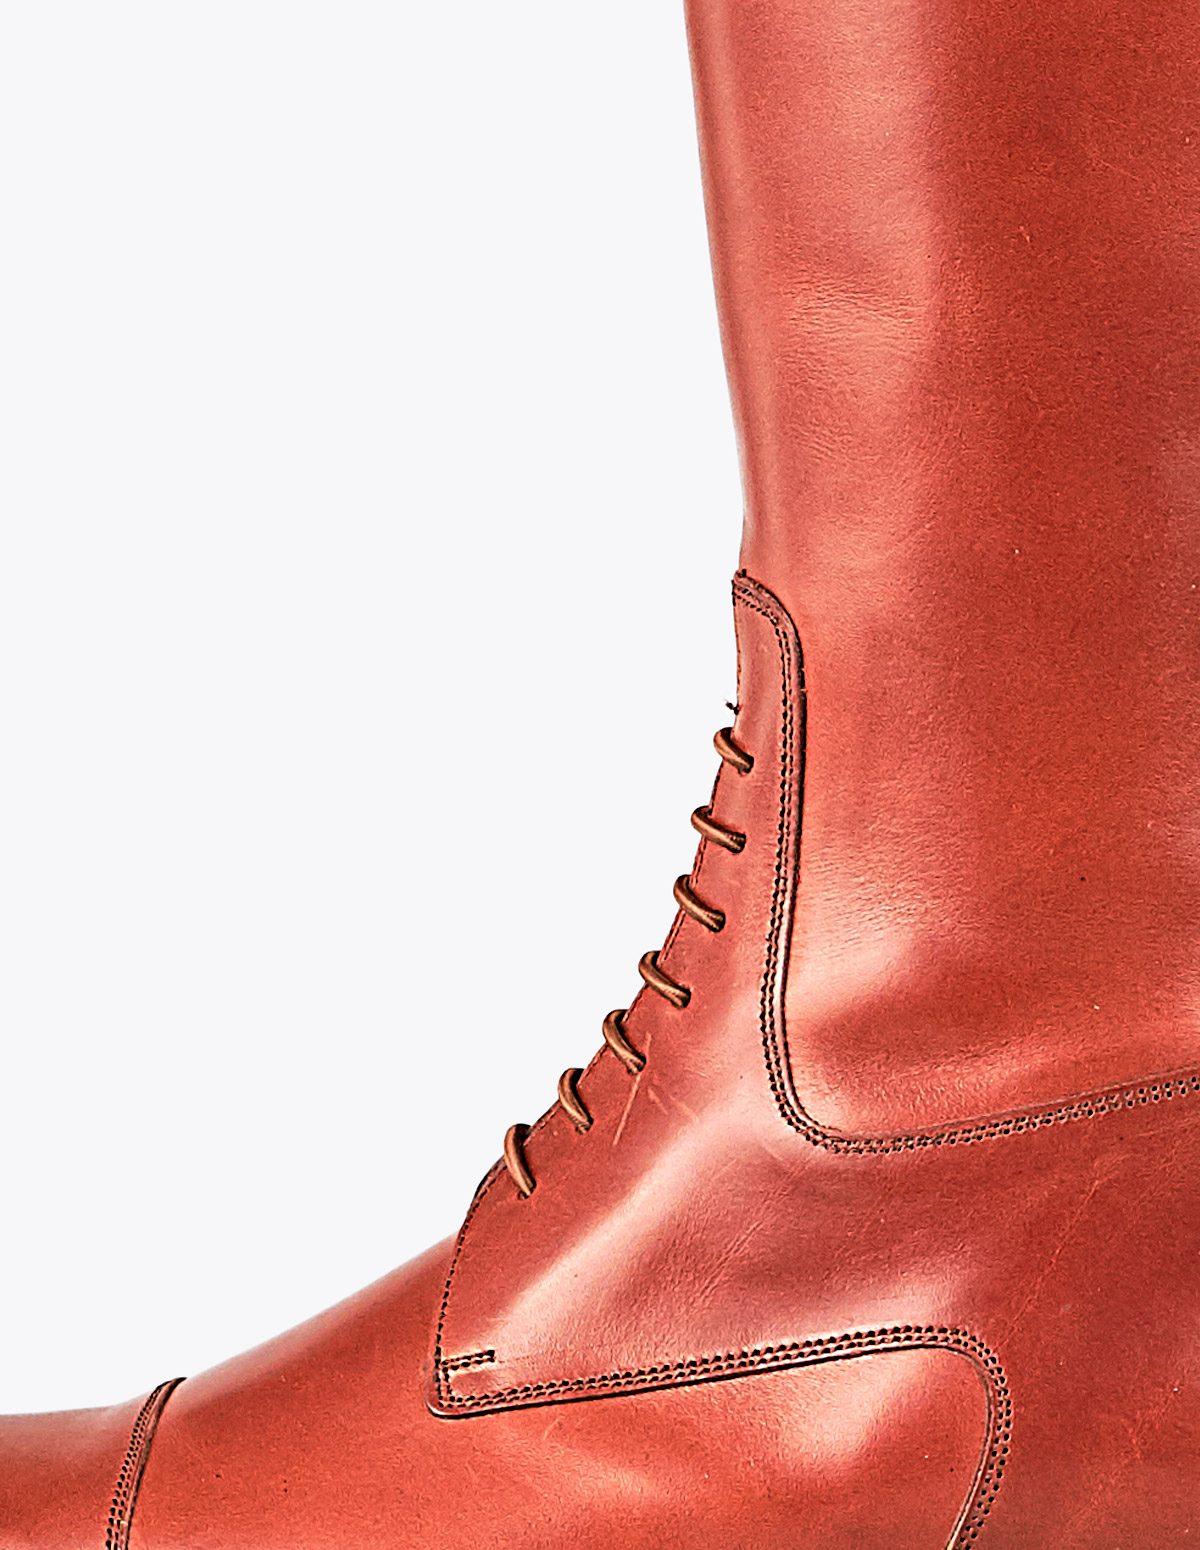 Bota Hípica S, tailor made shoes, schuhe nach mass en mandalashoes Santanyí Mallorca